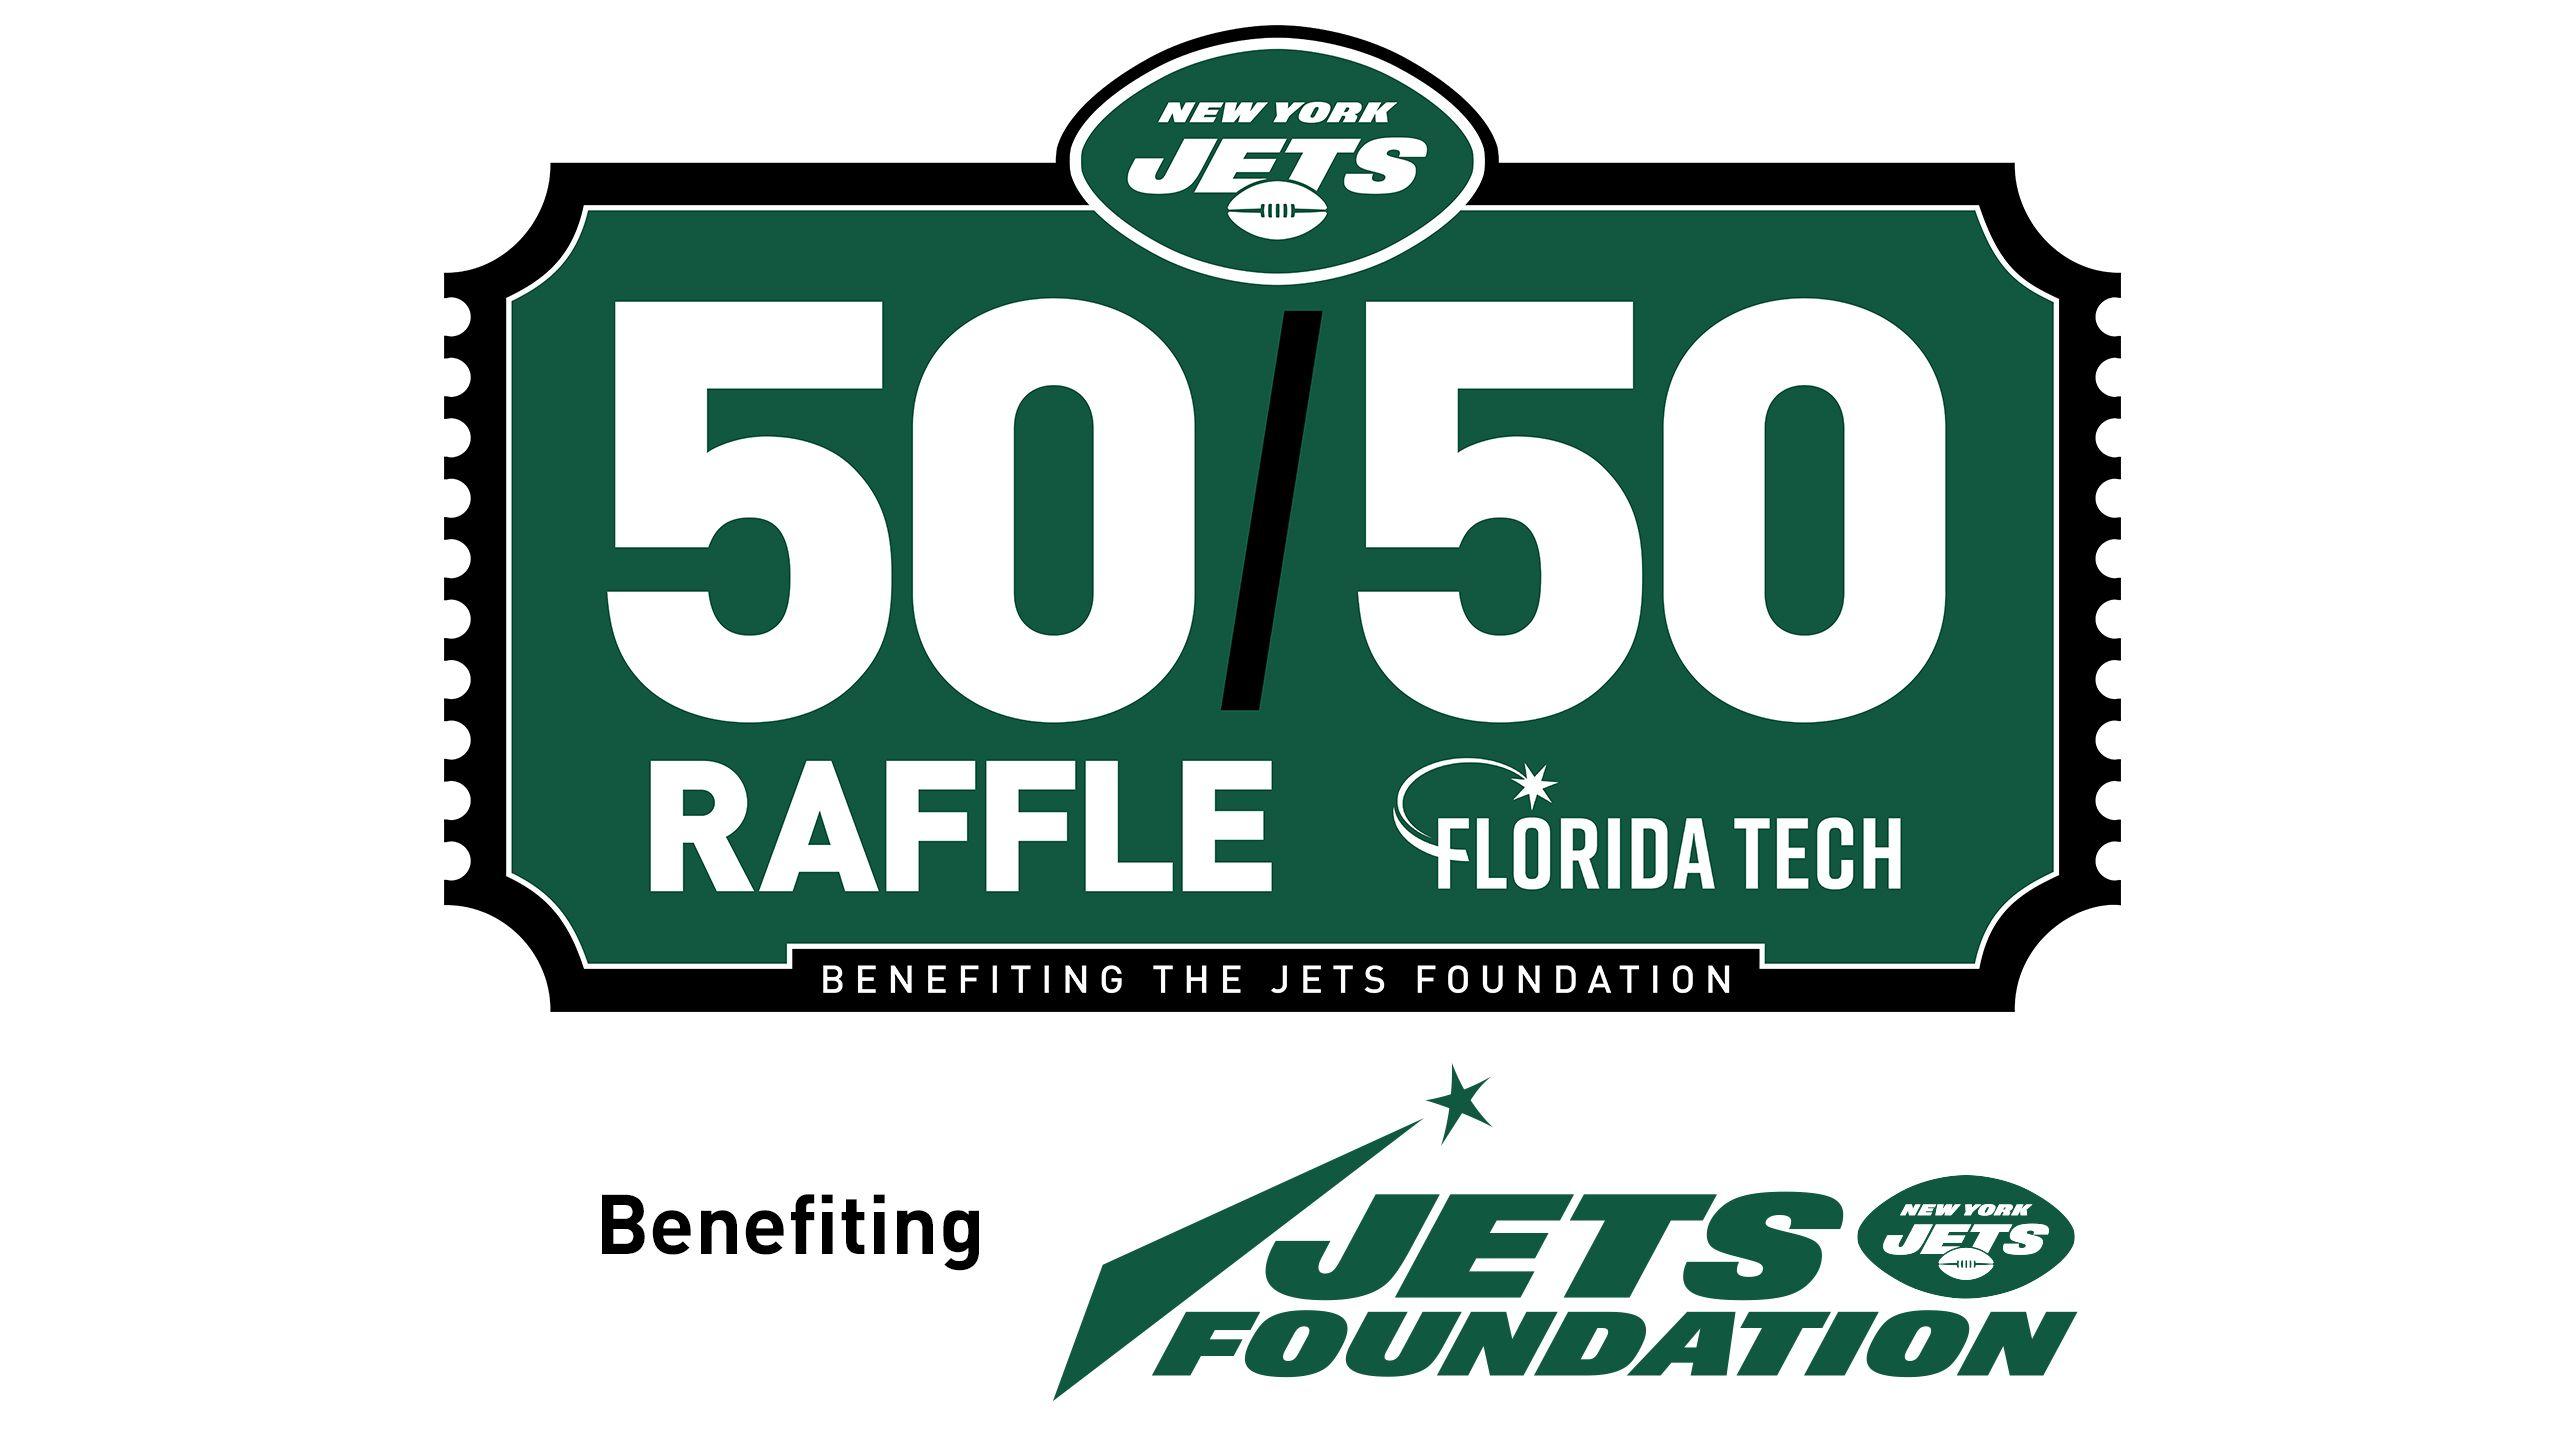 50/50 Raffle presented by Florida Tech